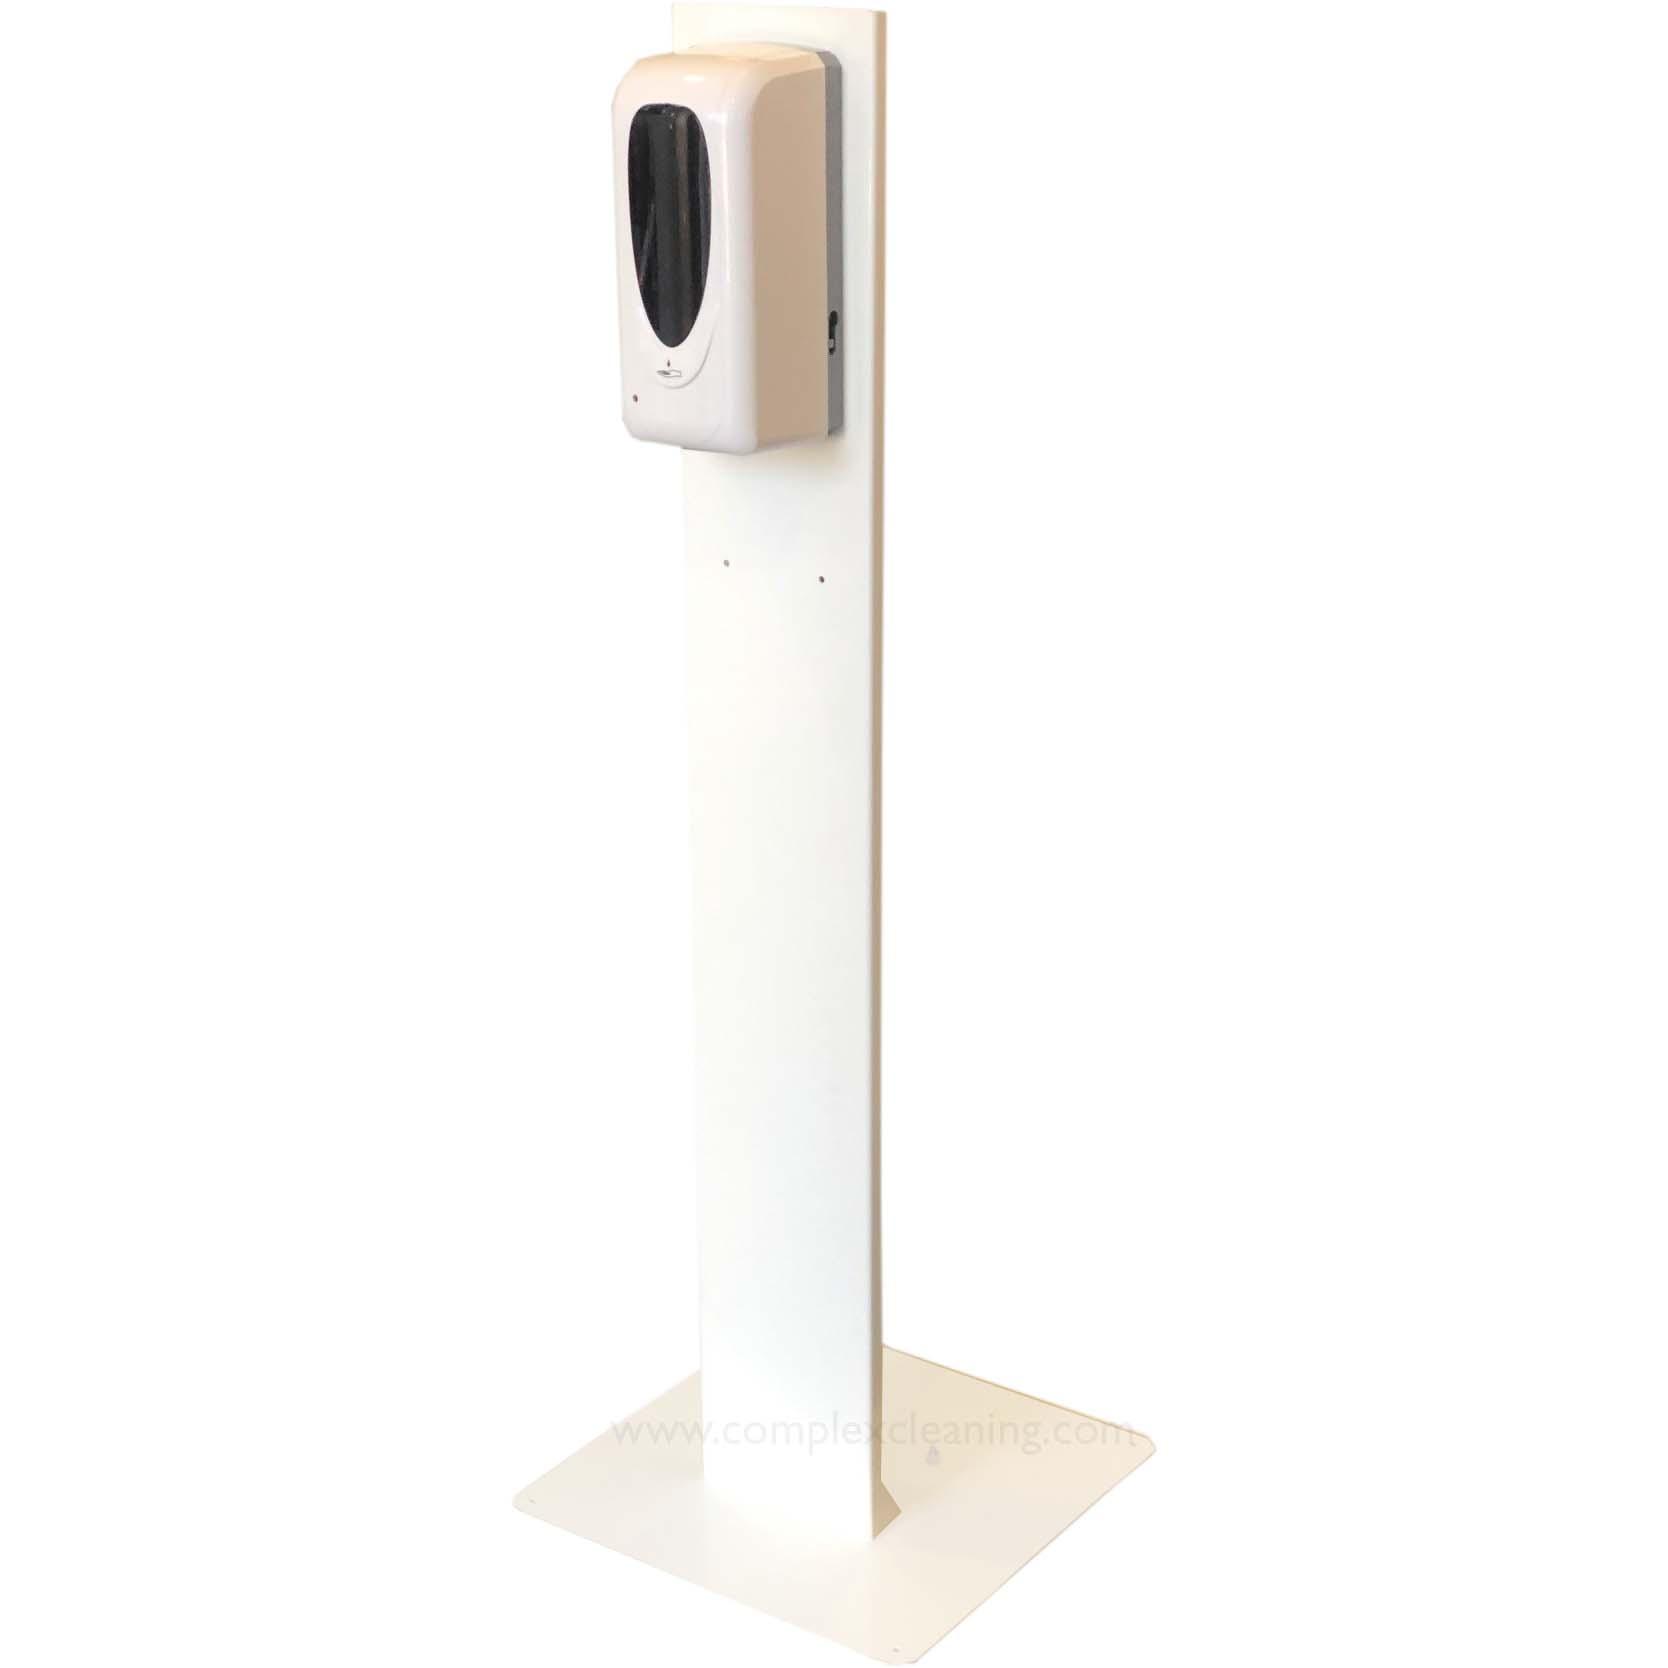 QD-Auto-Sanitiser-Station--Stand--dispenser--4-adhesive-pads-